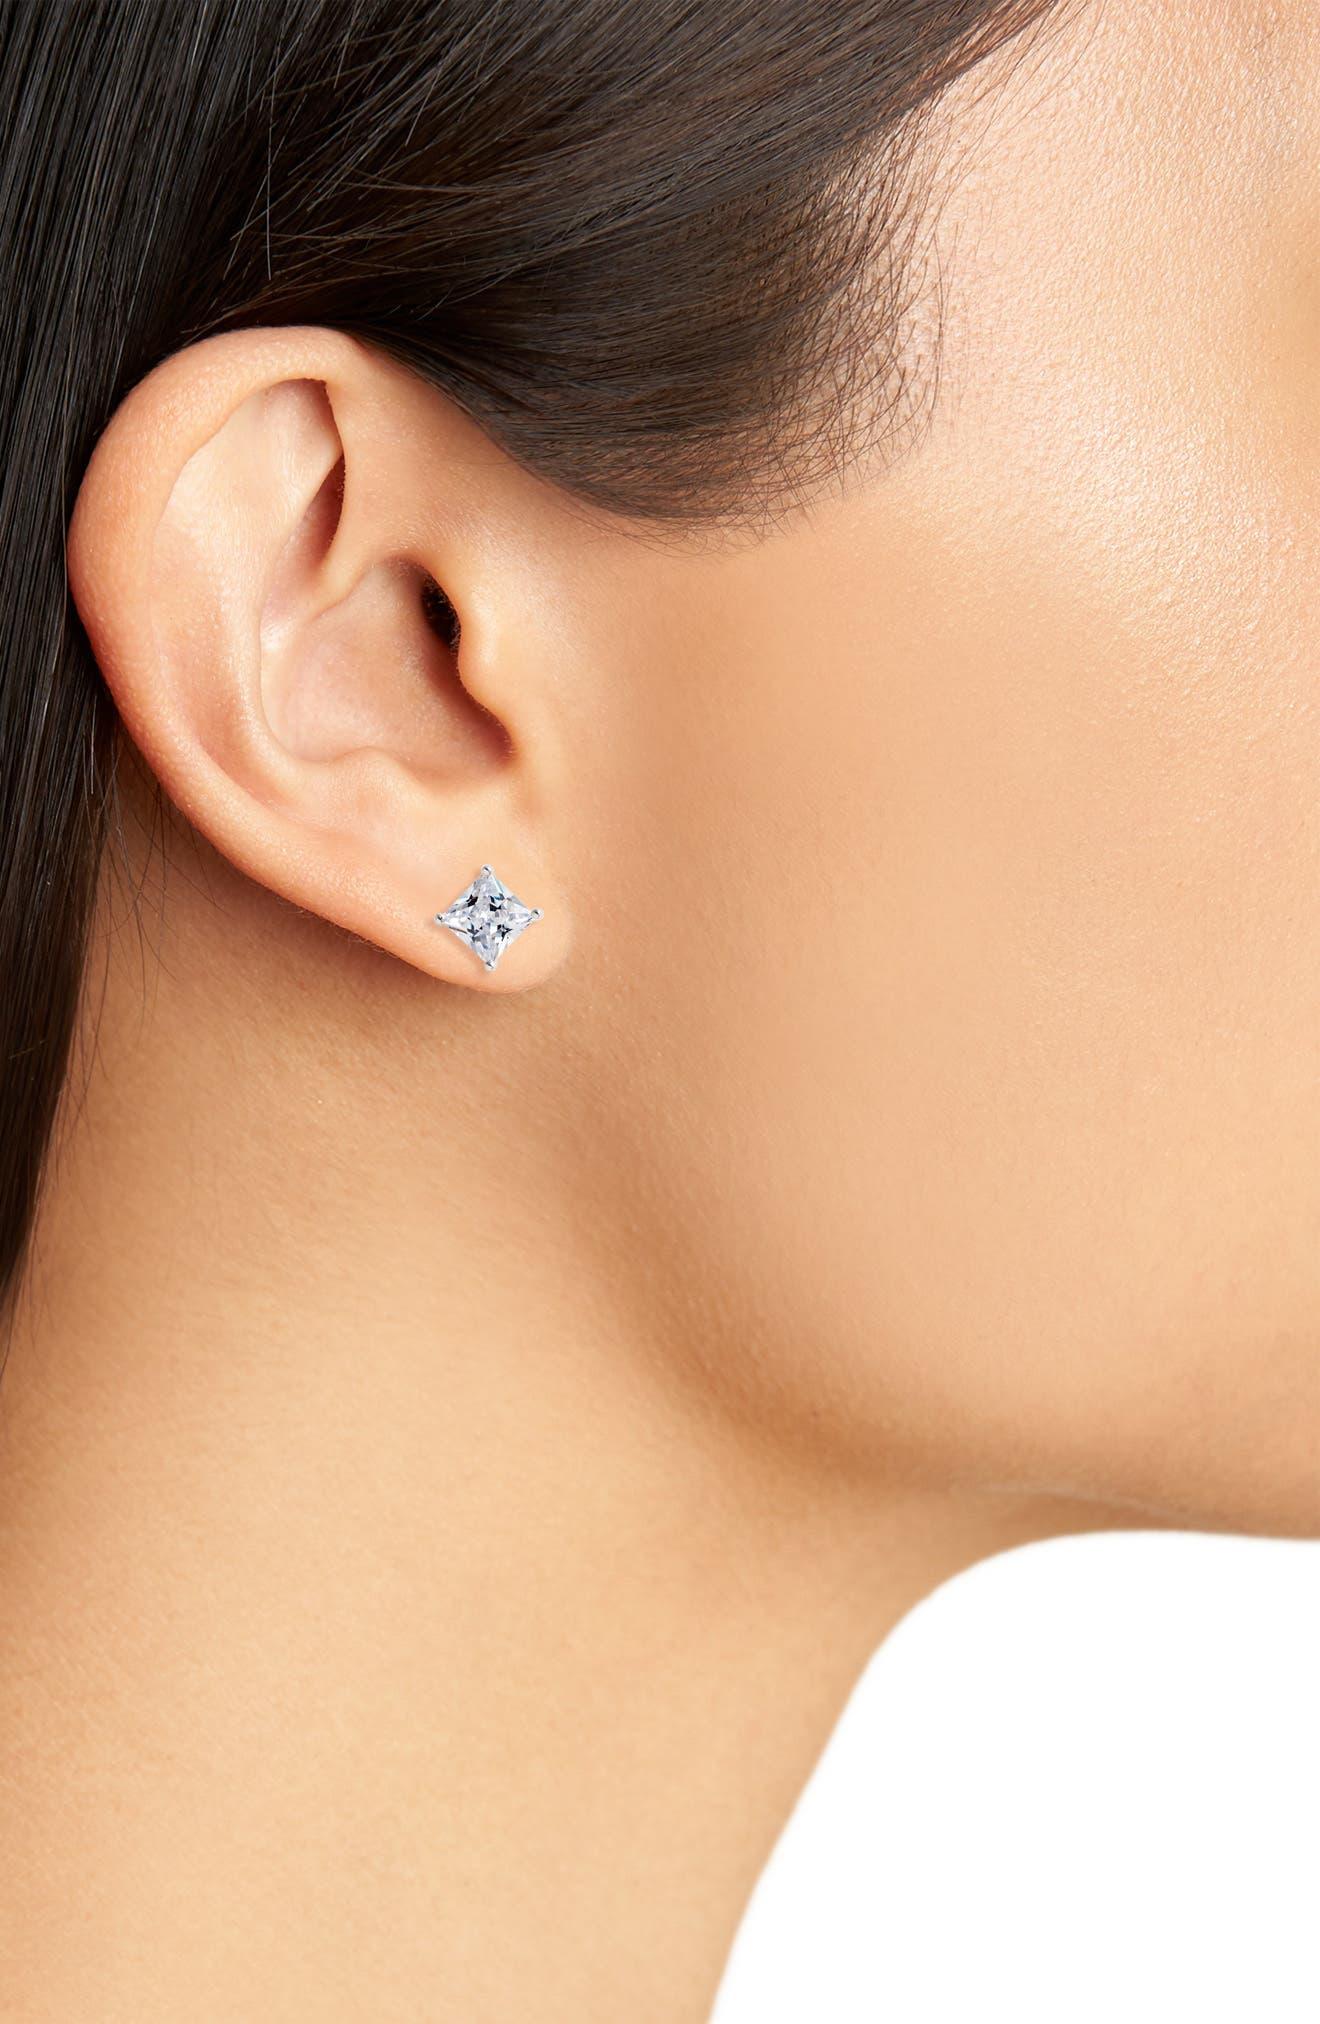 4ct tw Princess Cut Cubic Zirconia Stud Earrings,                             Alternate thumbnail 2, color,                             Platinum